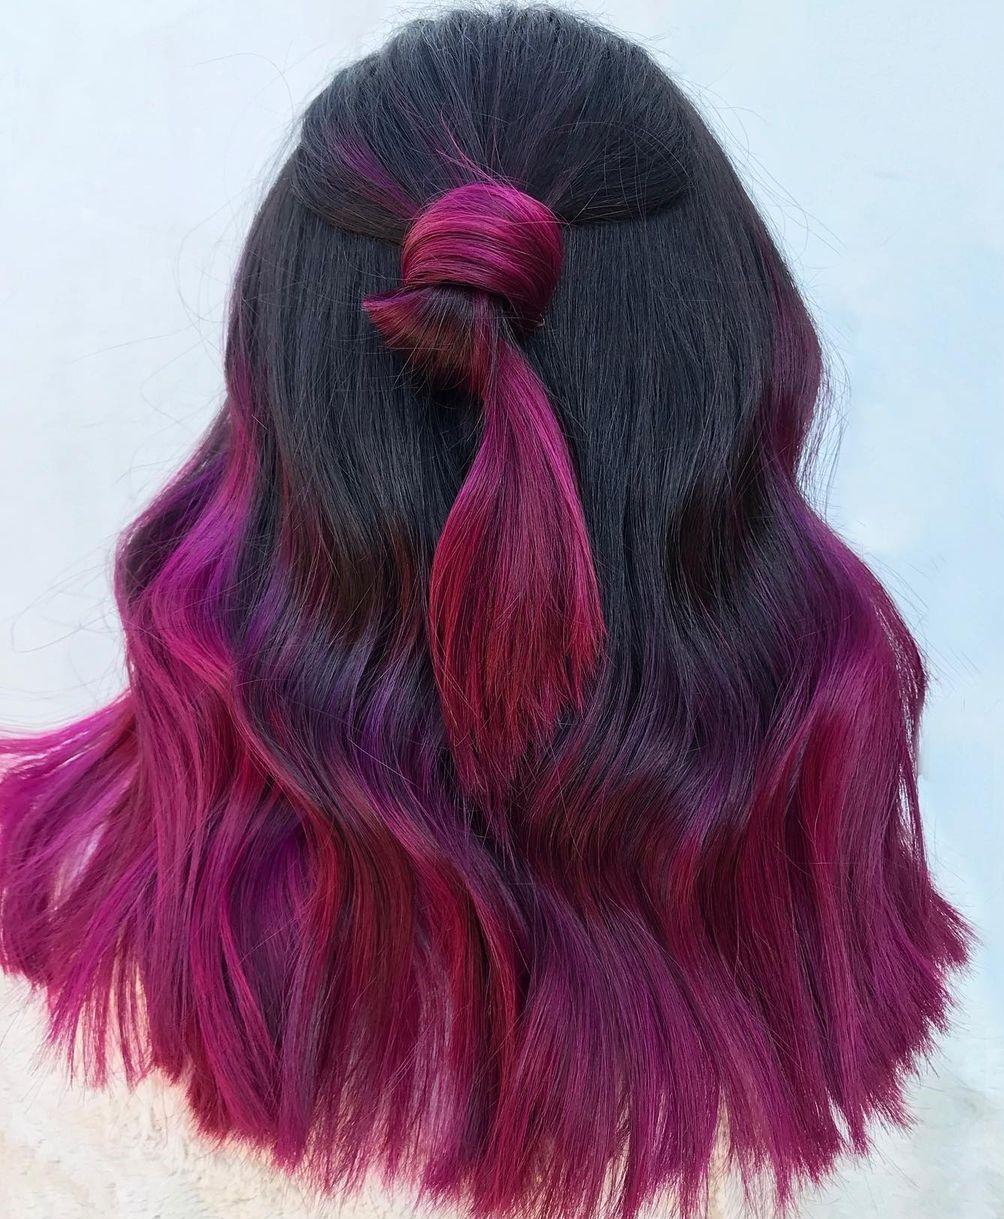 Black Hair with Fuchsia Ends